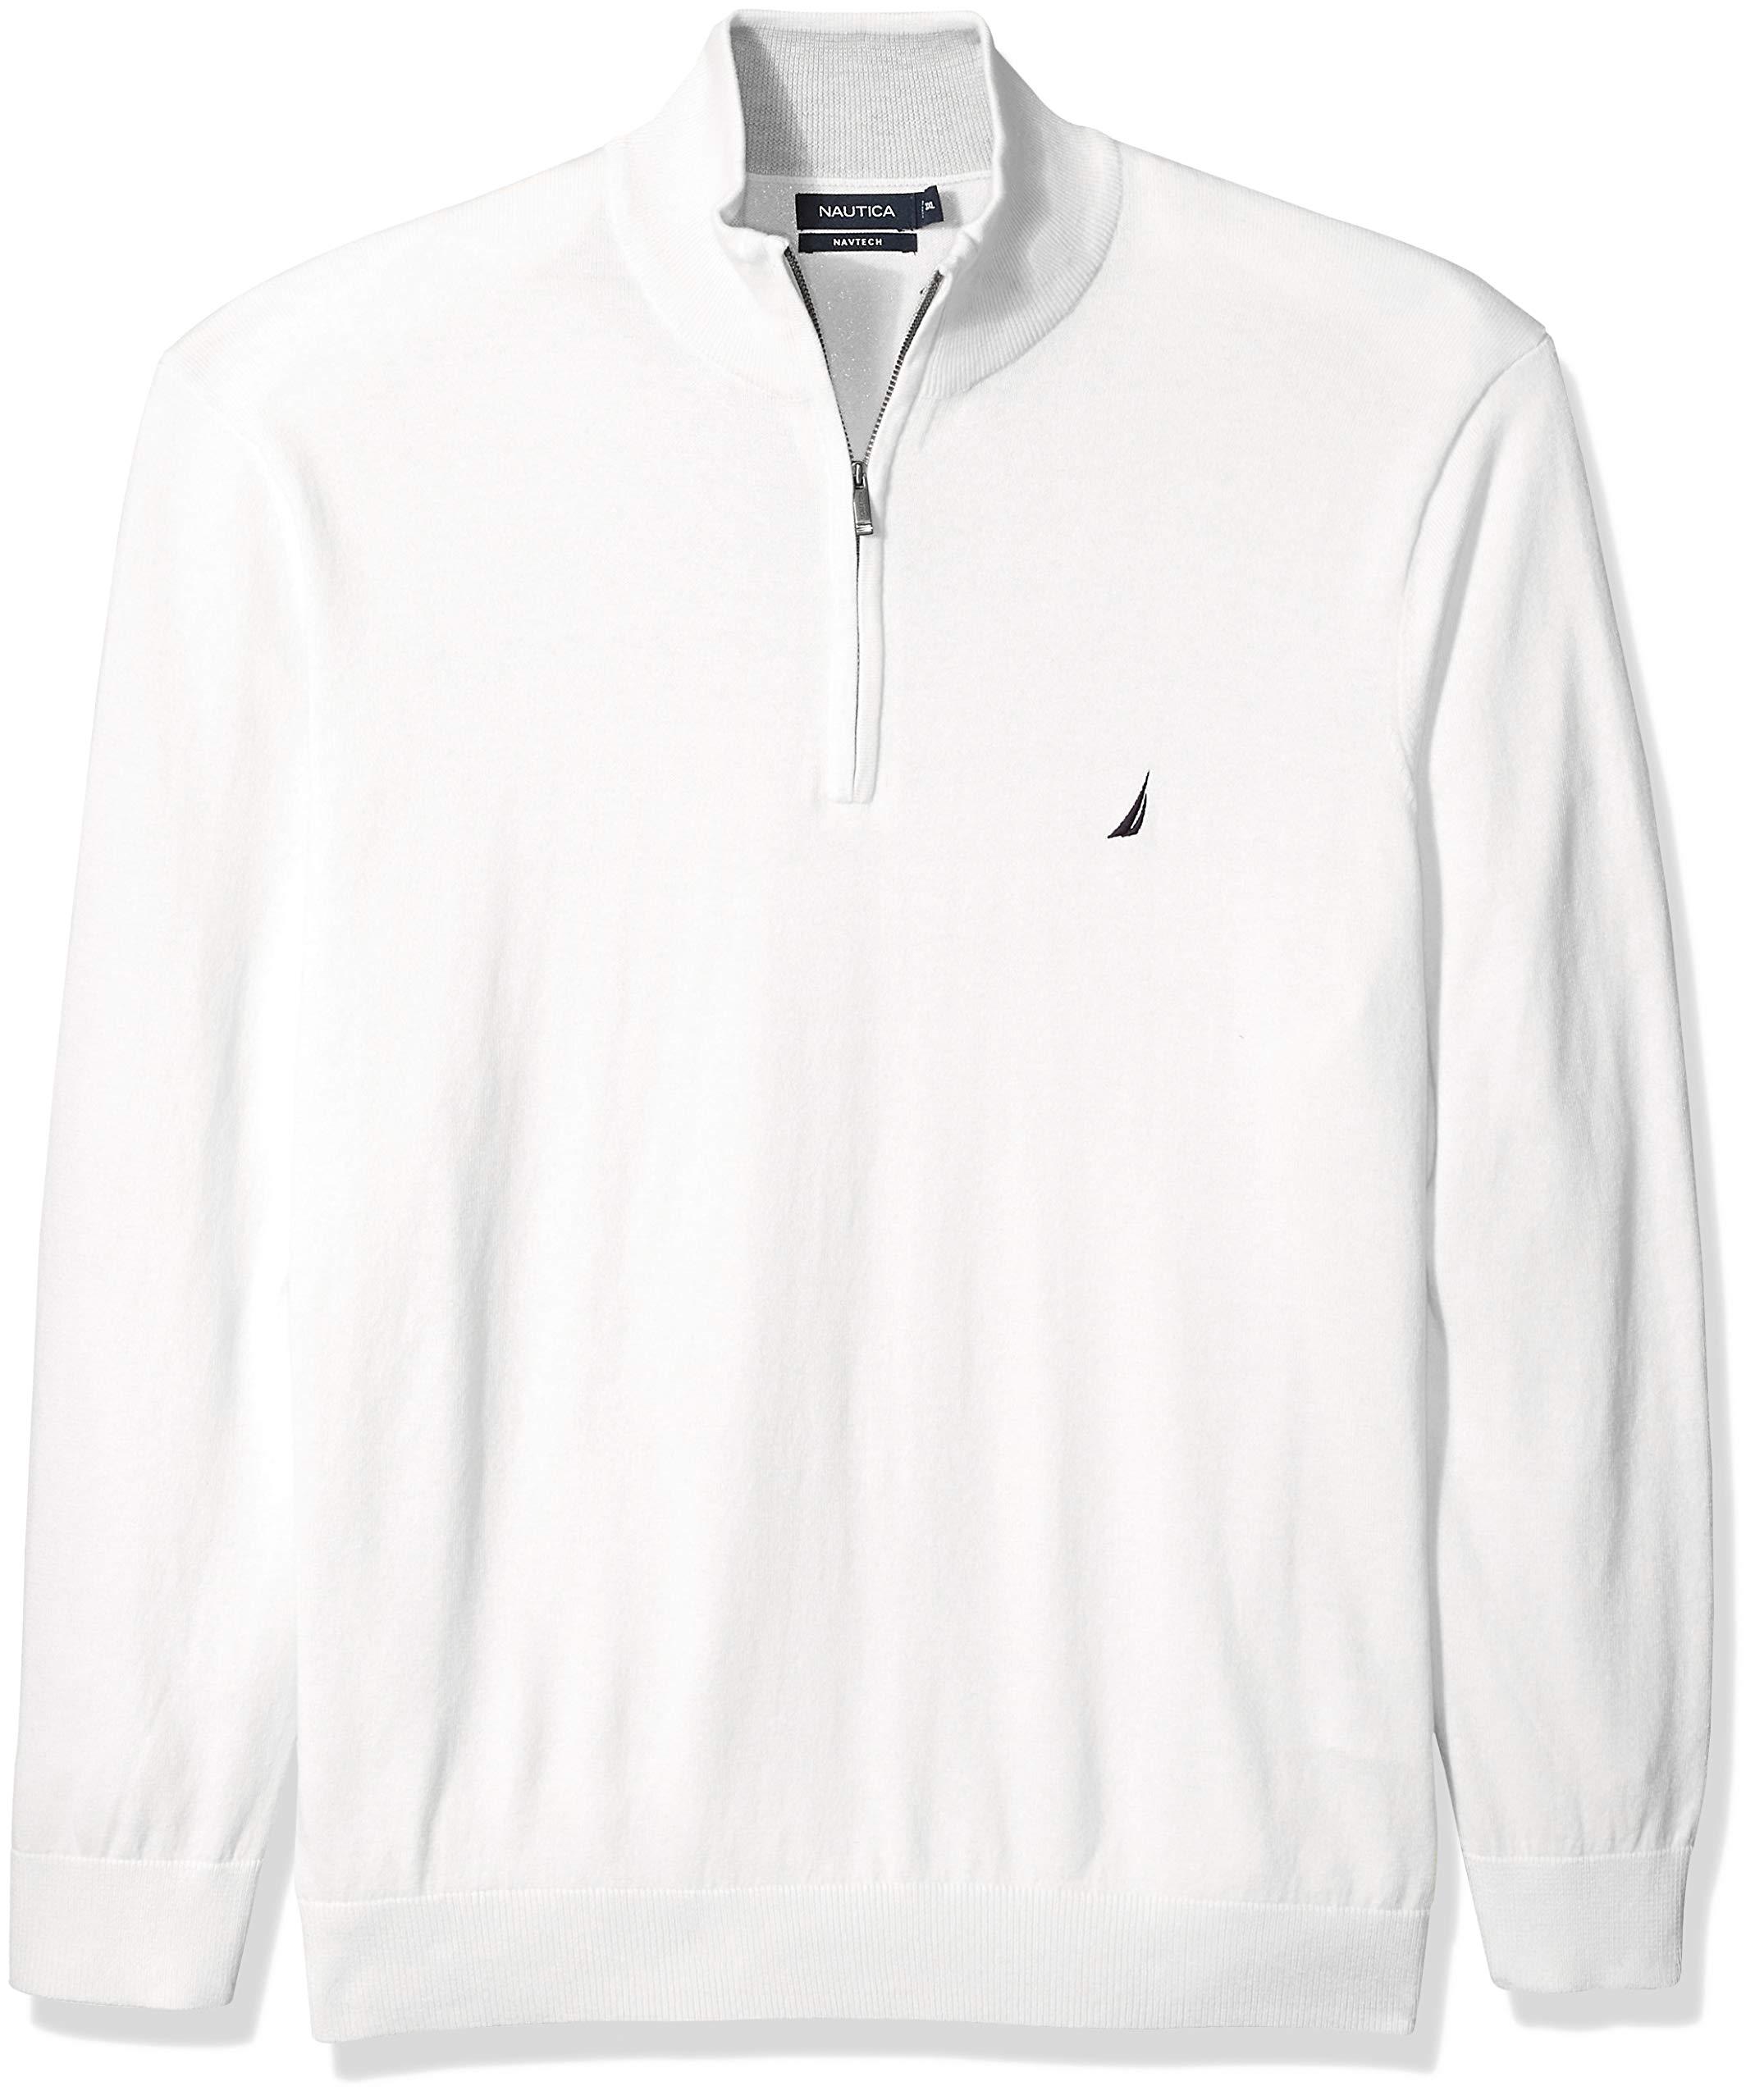 Nautica Men's Big and Tall Half-Zip Mock Neck Sweater, Marshmallow, 3X-Large